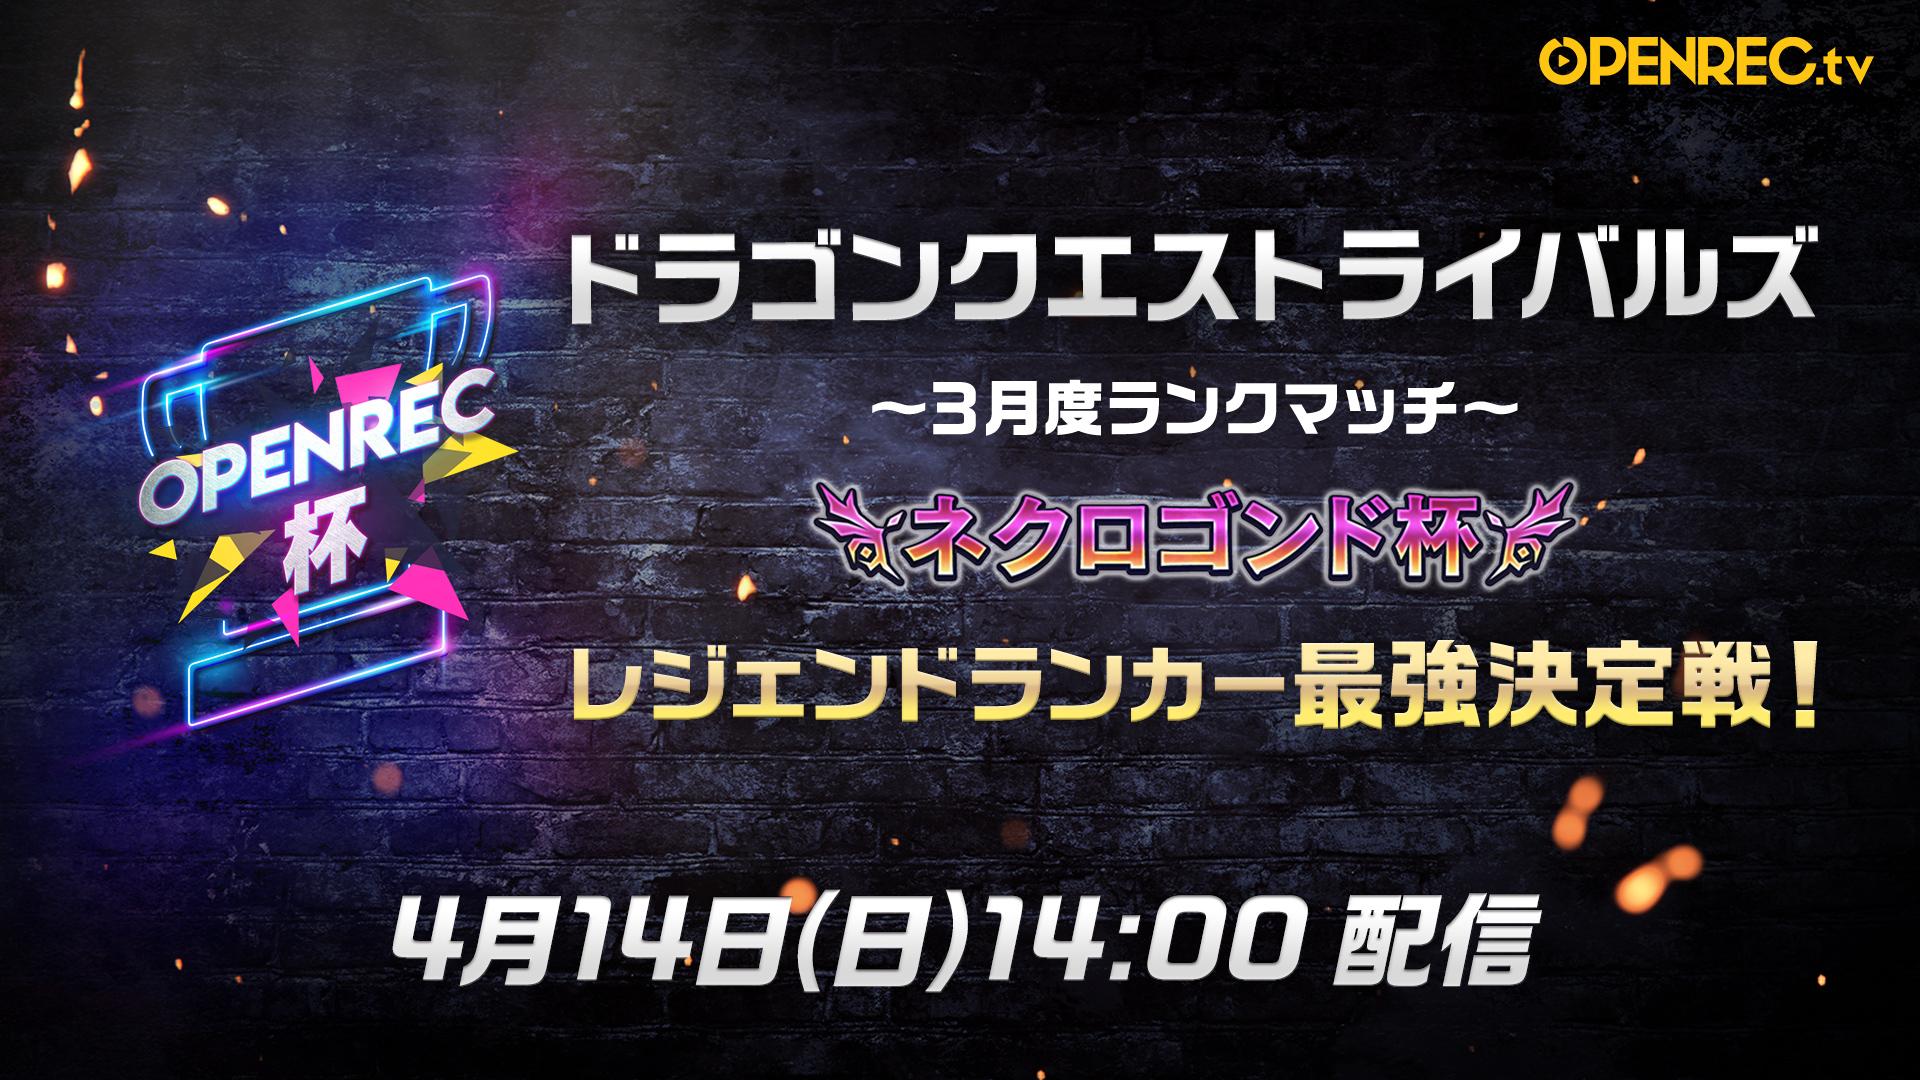 OPENREC杯〜3月度ランクマッチ「ネクロゴンド杯」〜